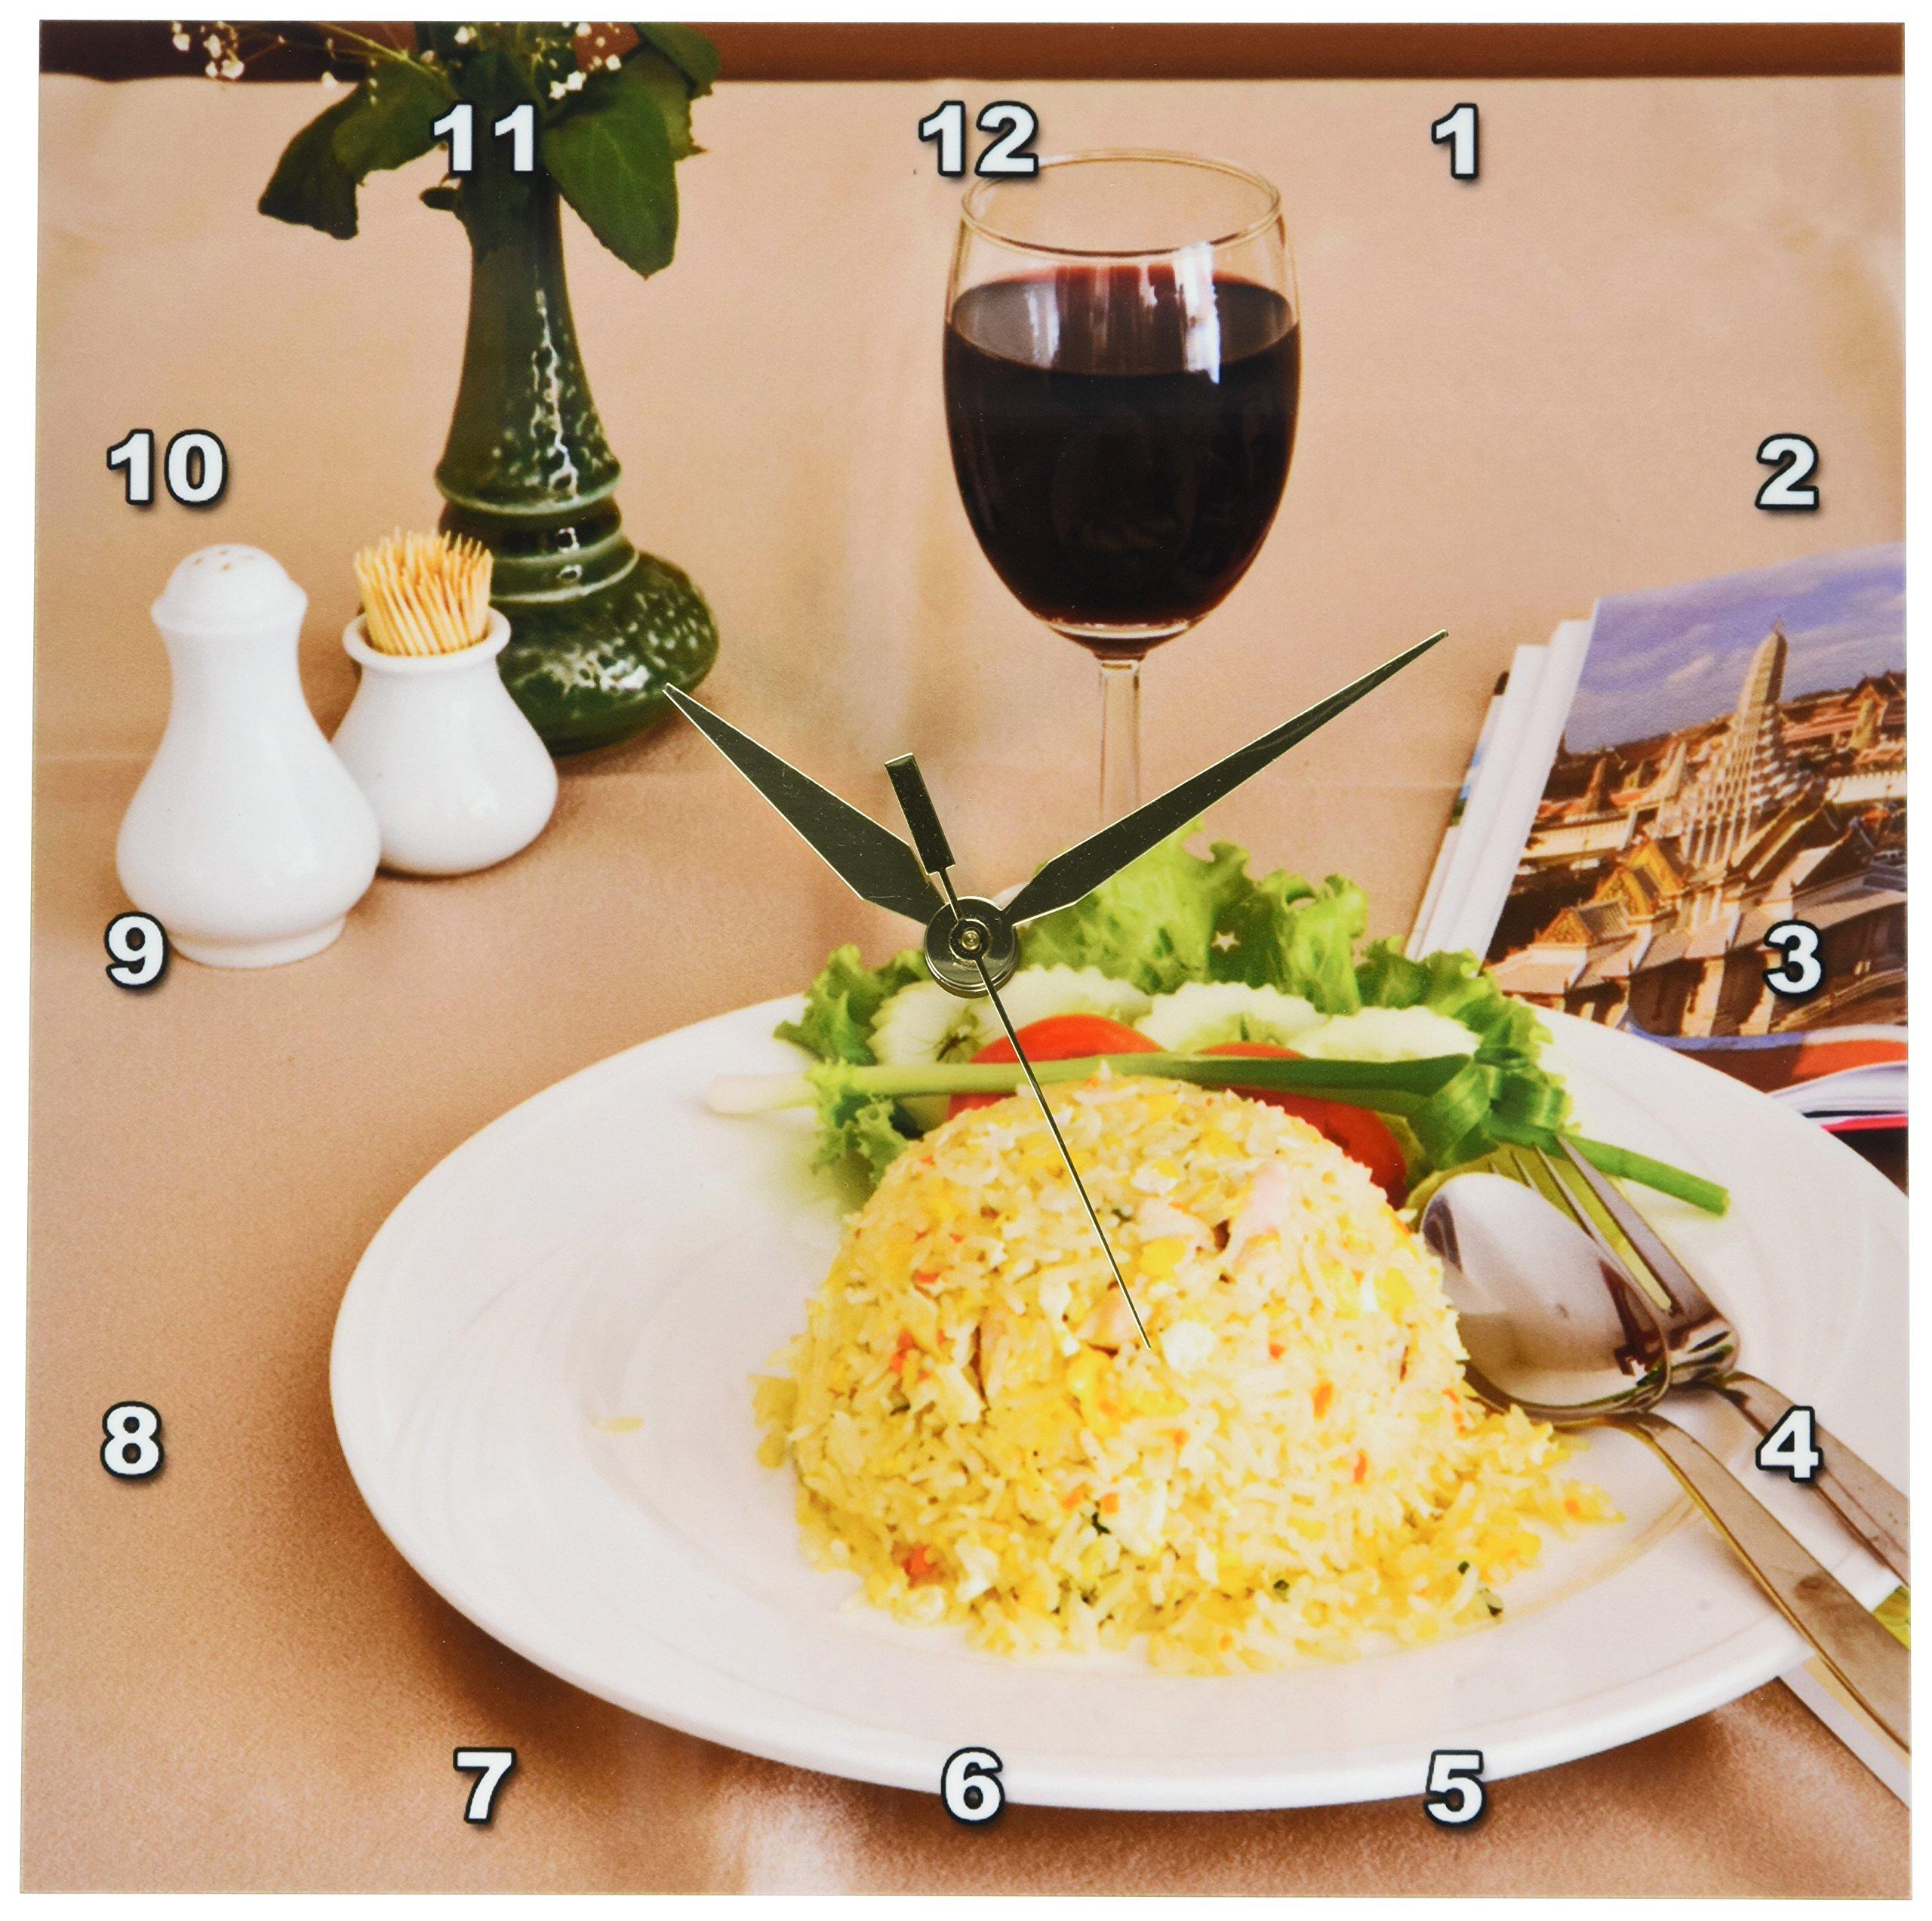 3dRose dpp_71364_1 Cuisine, Thai Restaurant, Bangkok, Thailand-AS36AjE0192-Adam Jones-Wall Clock, 10 by 10-Inch by 3dRose